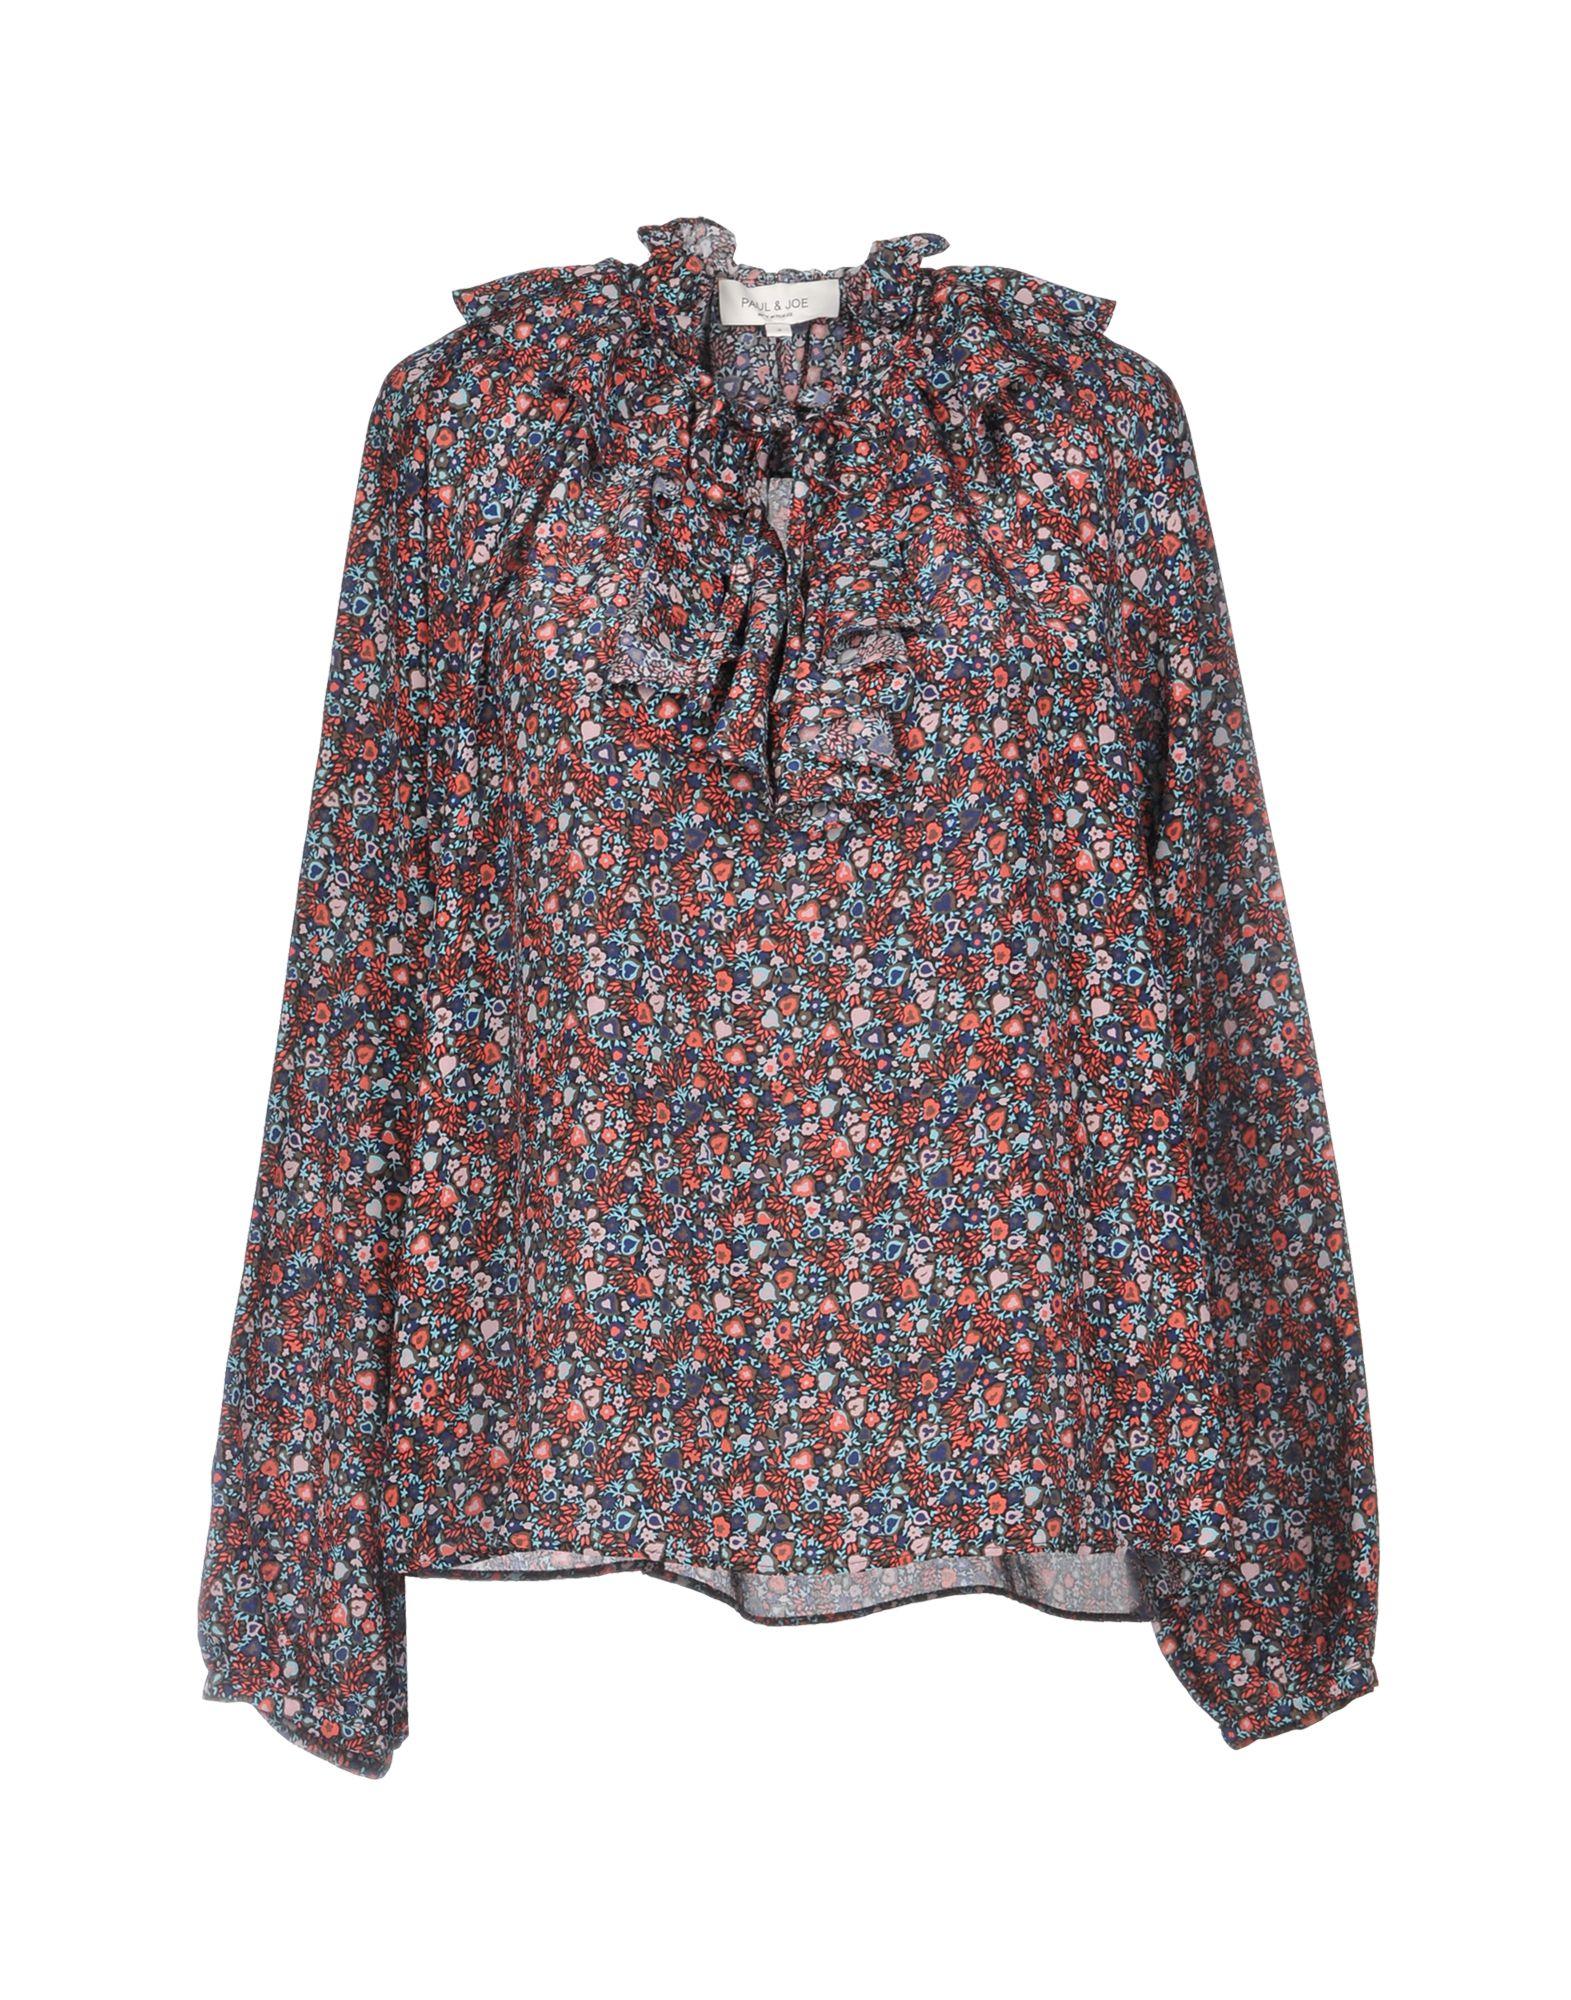 Фото - PAUL & JOE Блузка charlie joe блузка